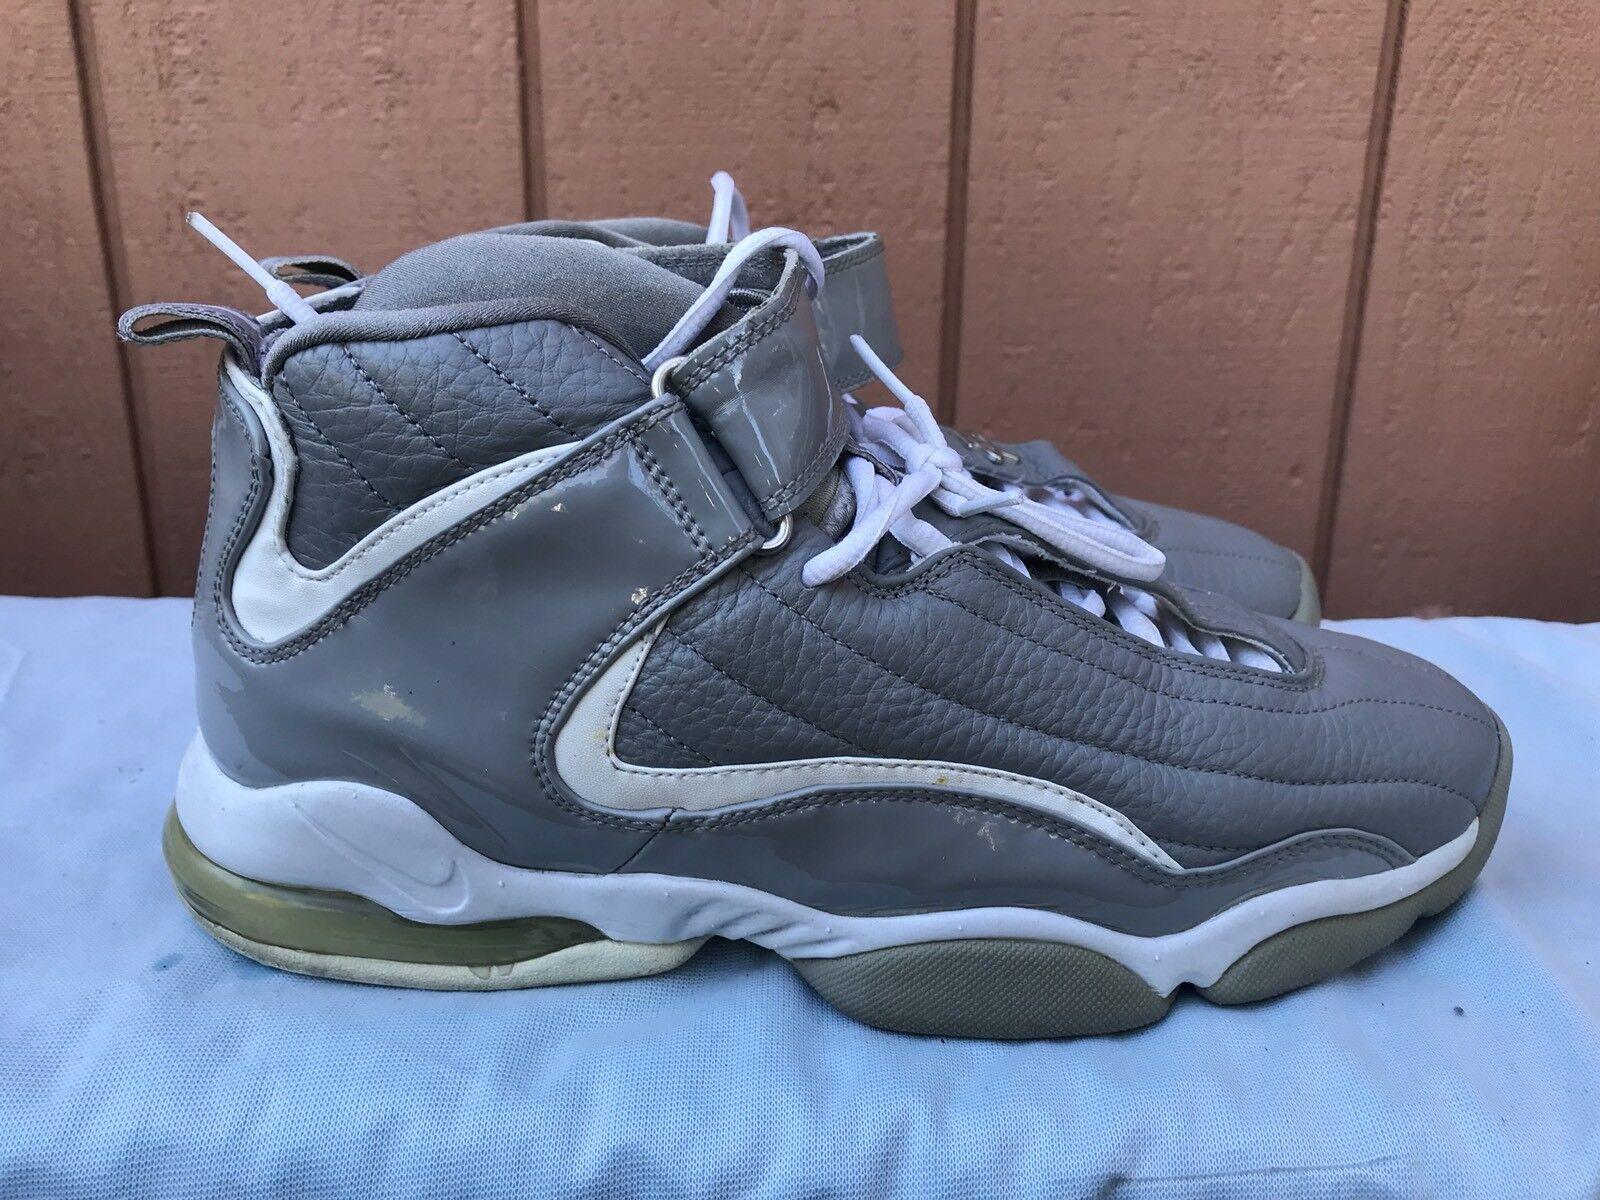 Rare EUC Nike Penny IV gris - blanco Hardaway 10,5 Vintage 2018 SZ US 10,5 Hardaway 302582-001 A3 0396a2